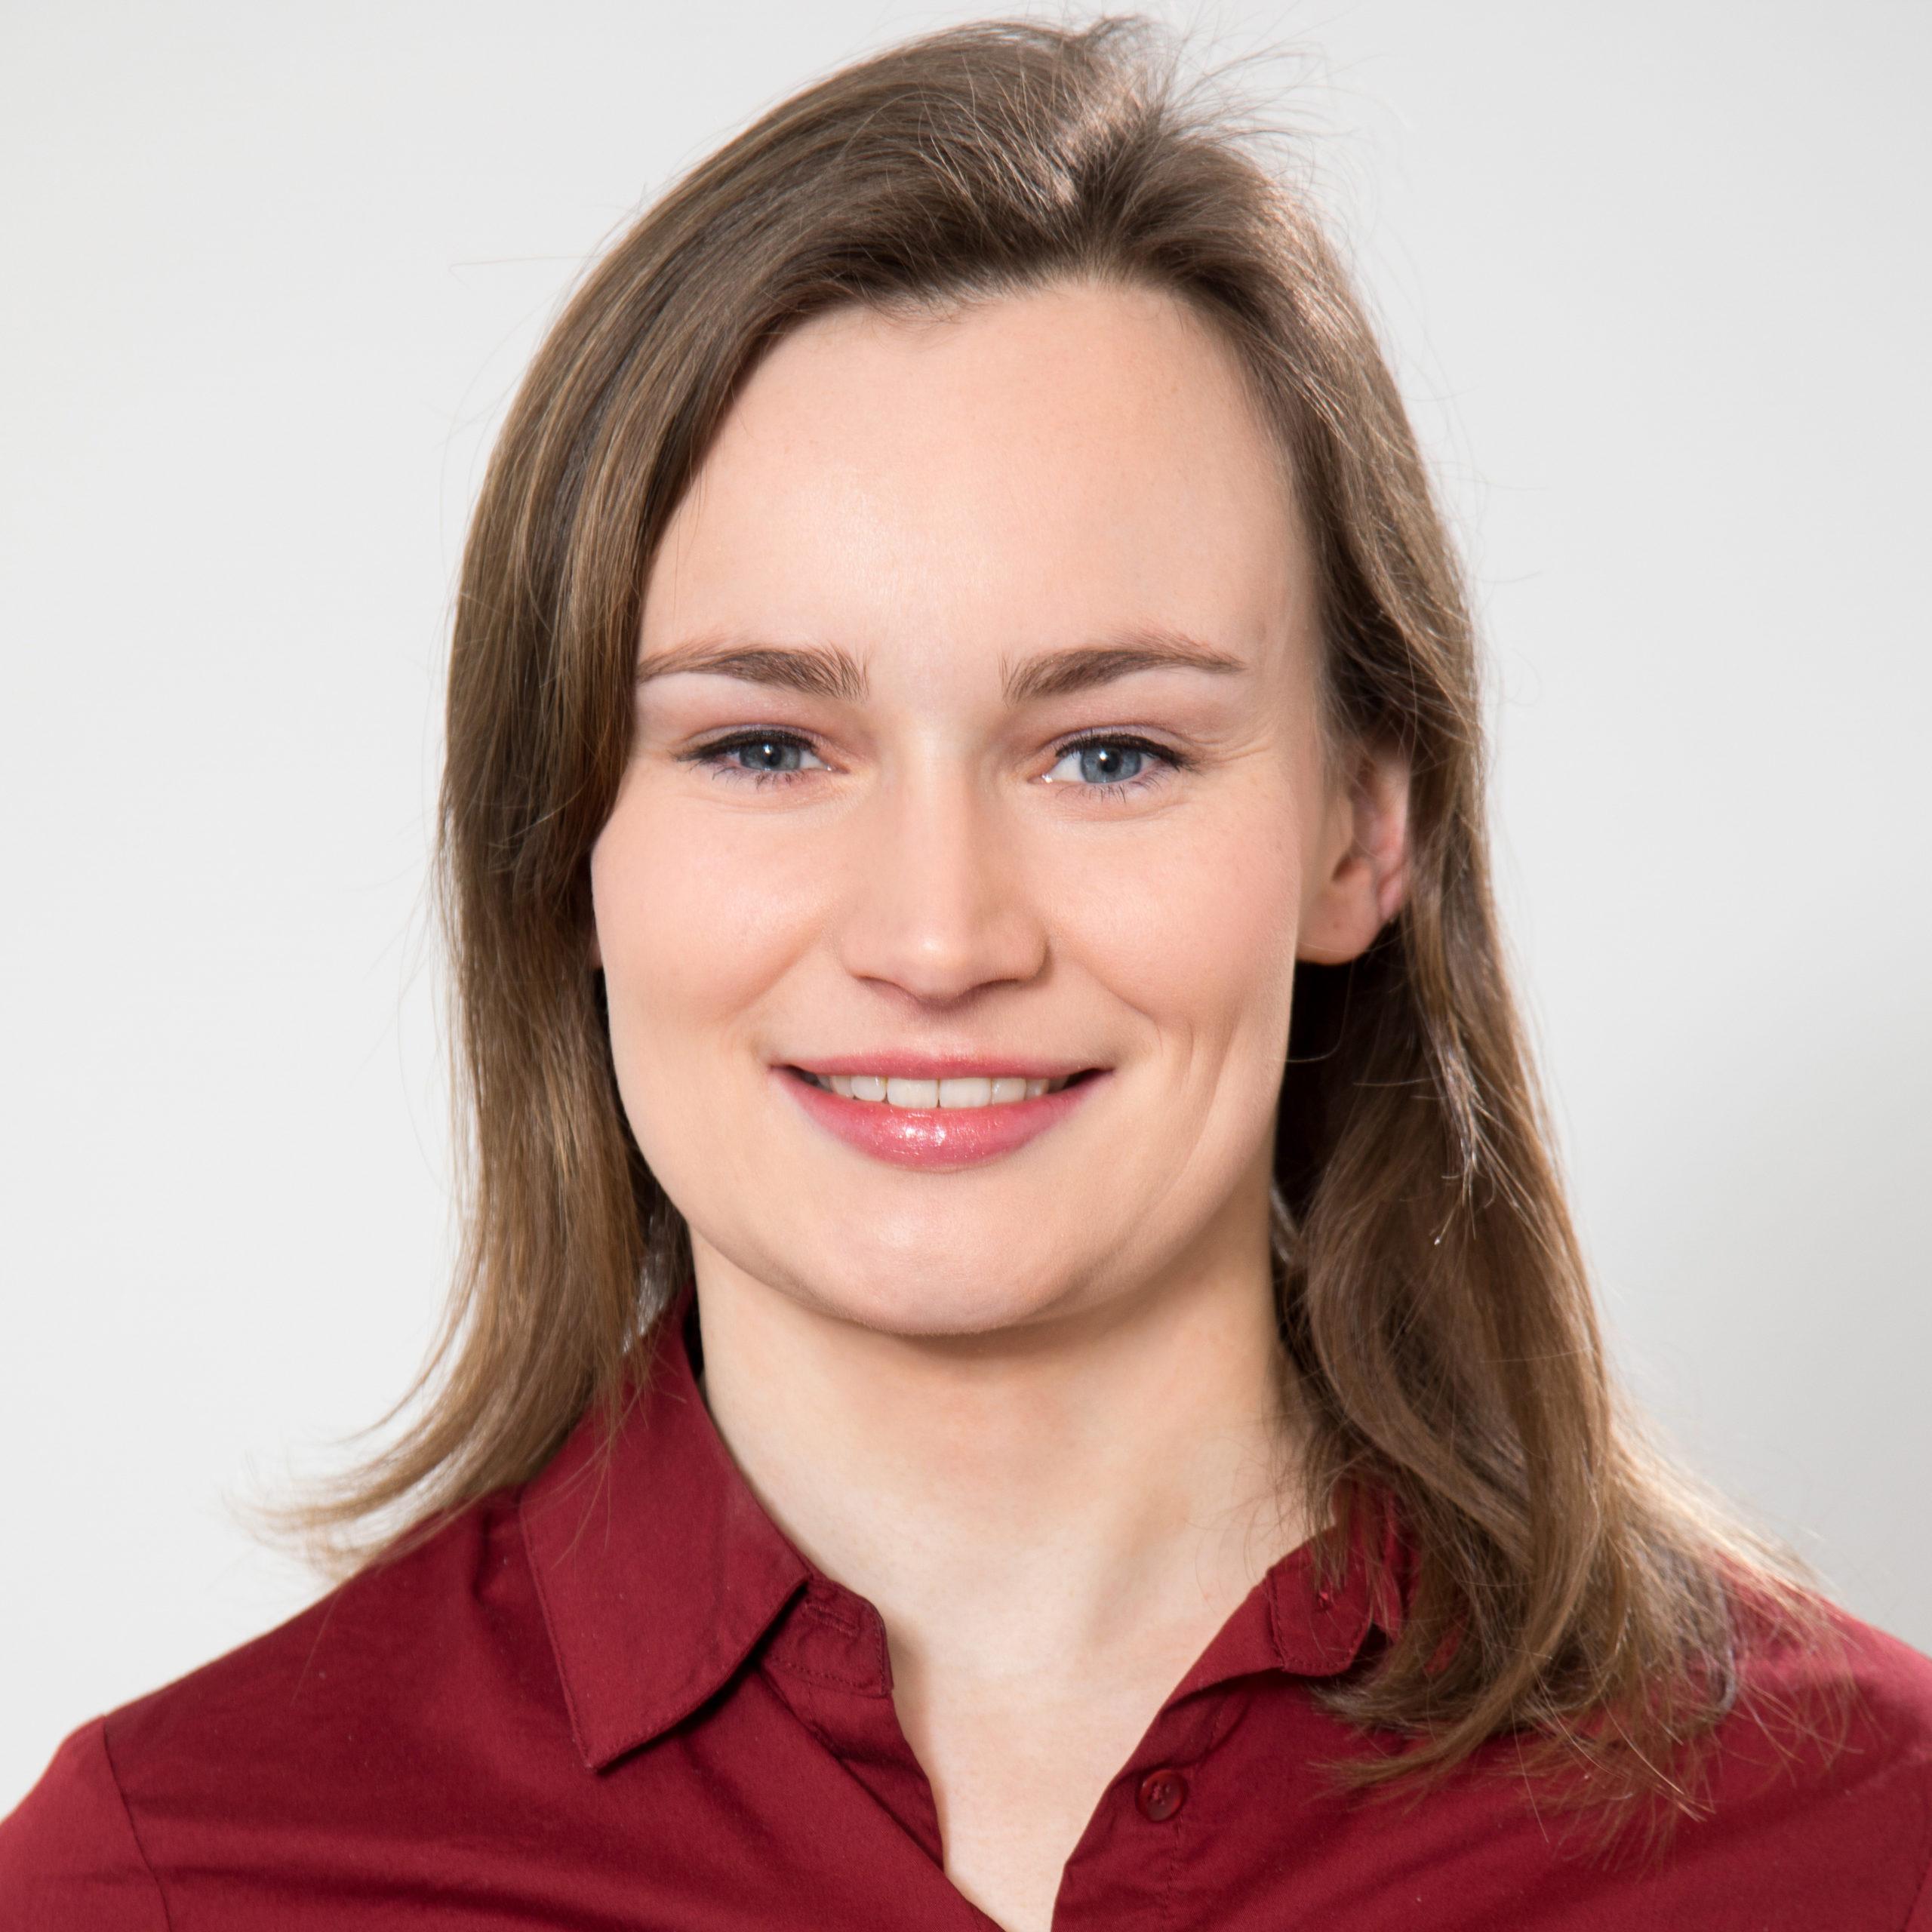 Esther Visser Prodeba zorgprofessional